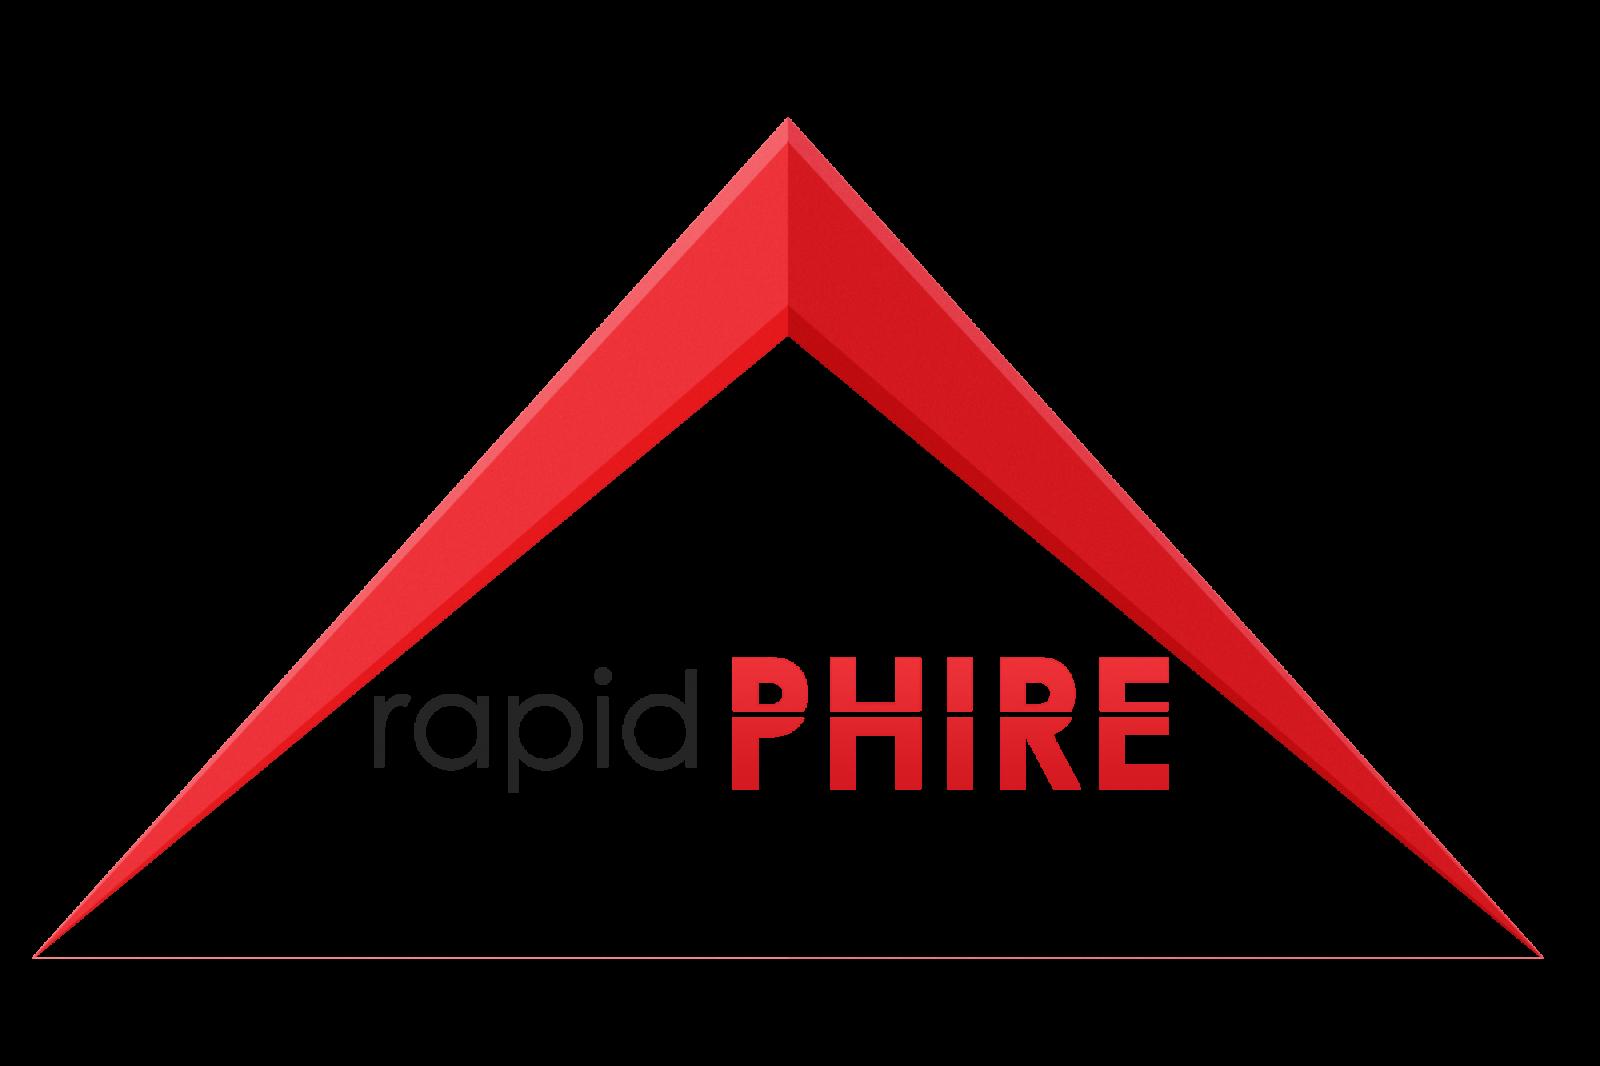 RHEA Group rapidPHIRE logo